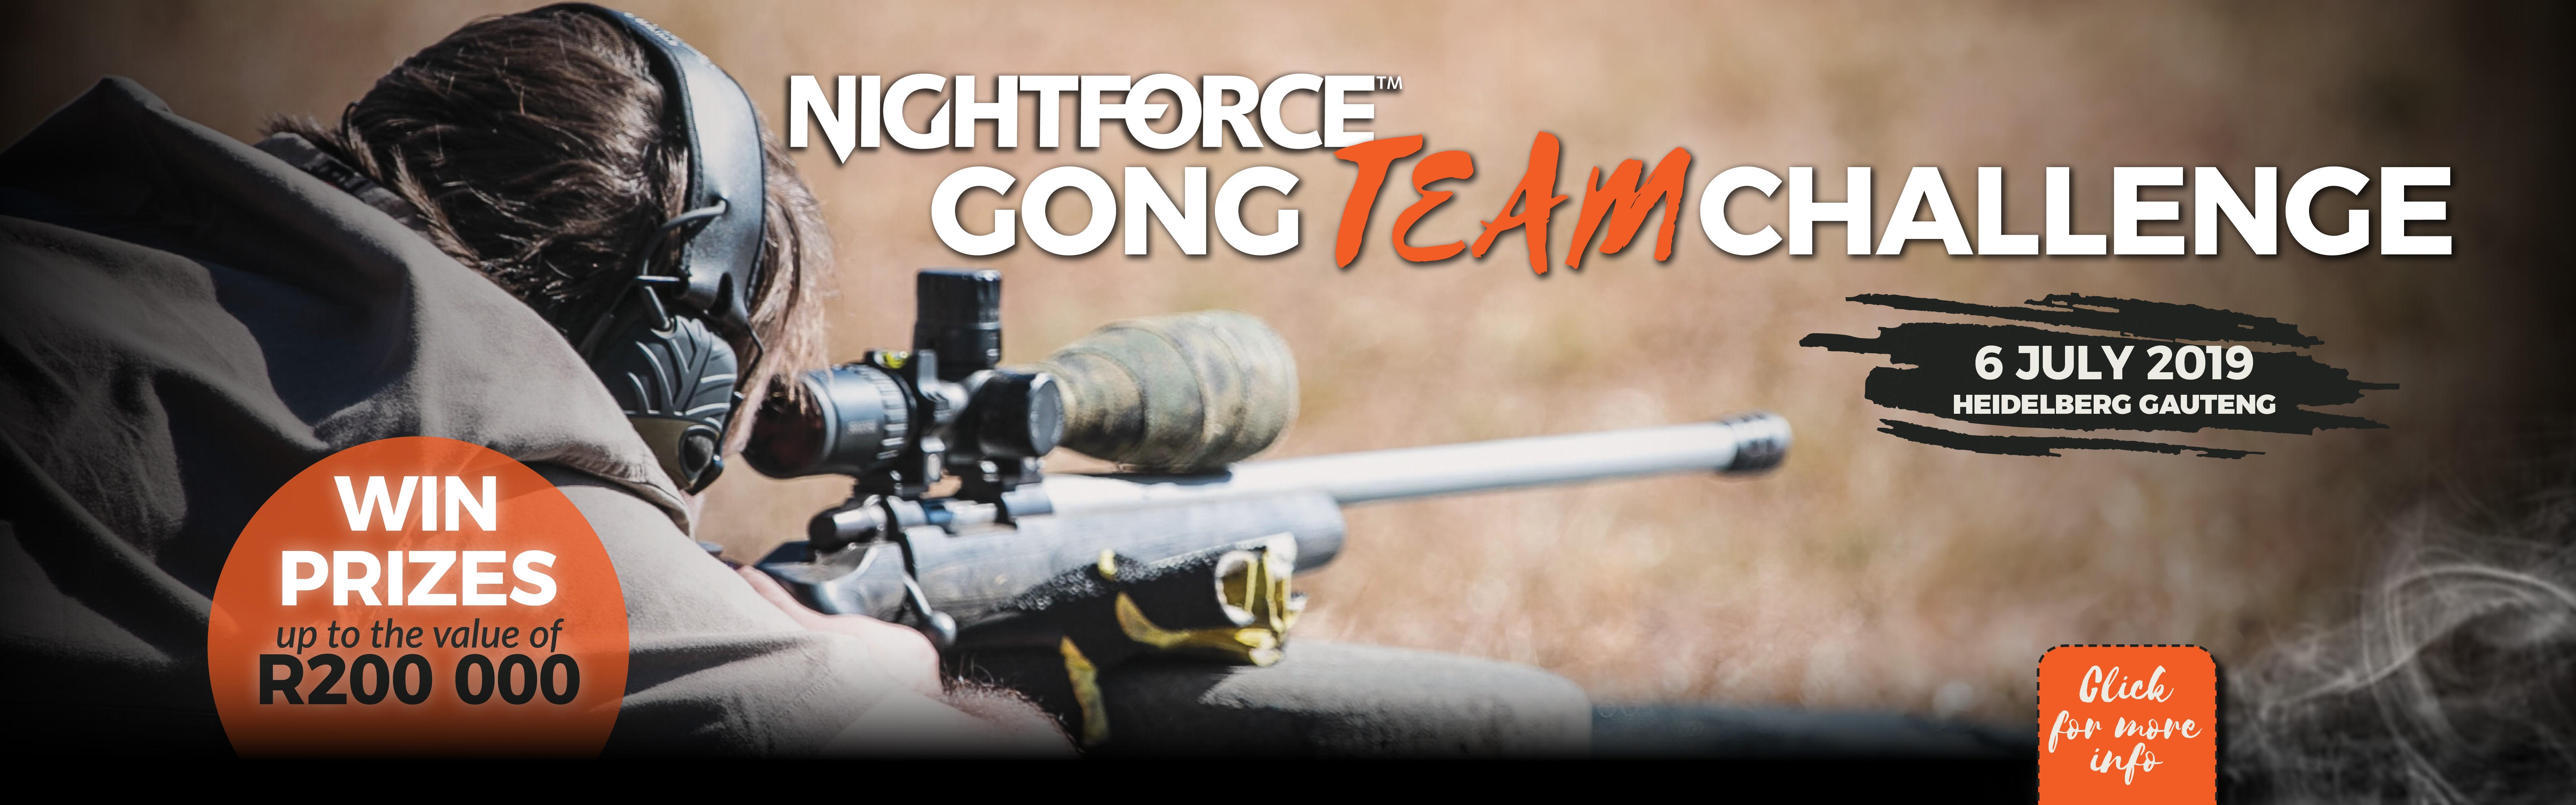 Safari Outdoor Nightforce Gong Challenge 6 July